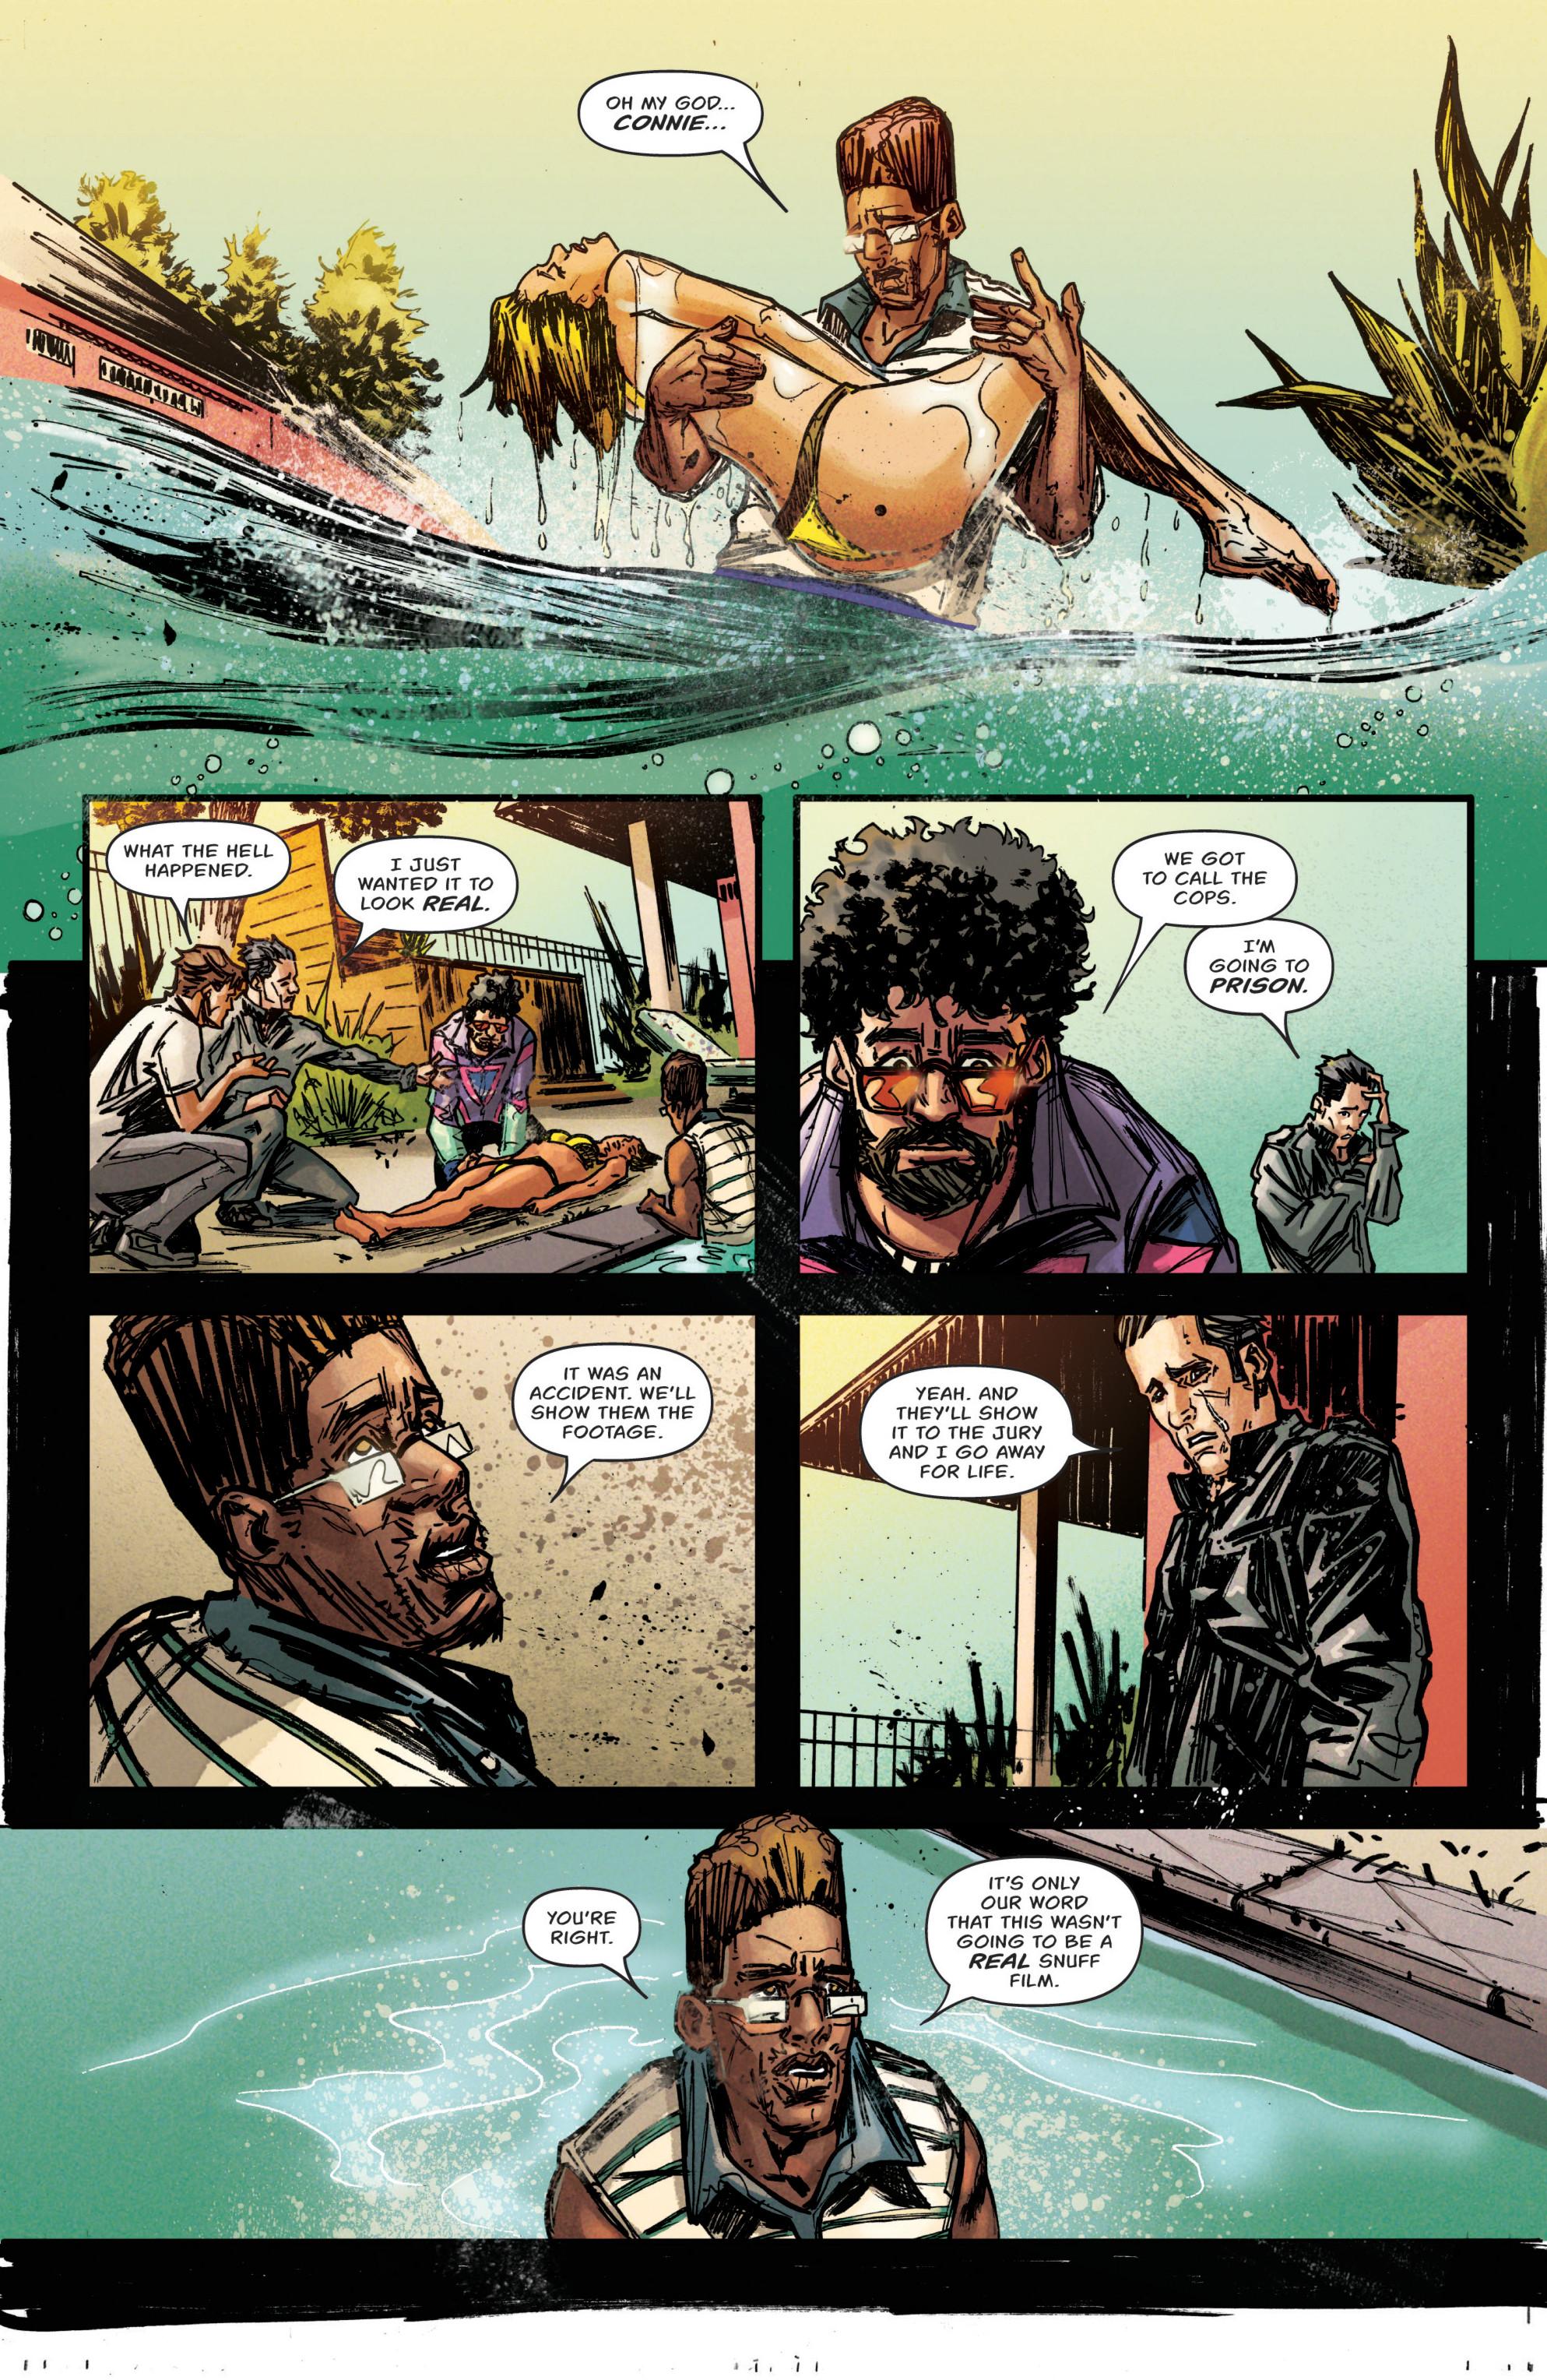 Read online Grimm Tales of Terror: Vol. 3 comic -  Issue #5 - 7